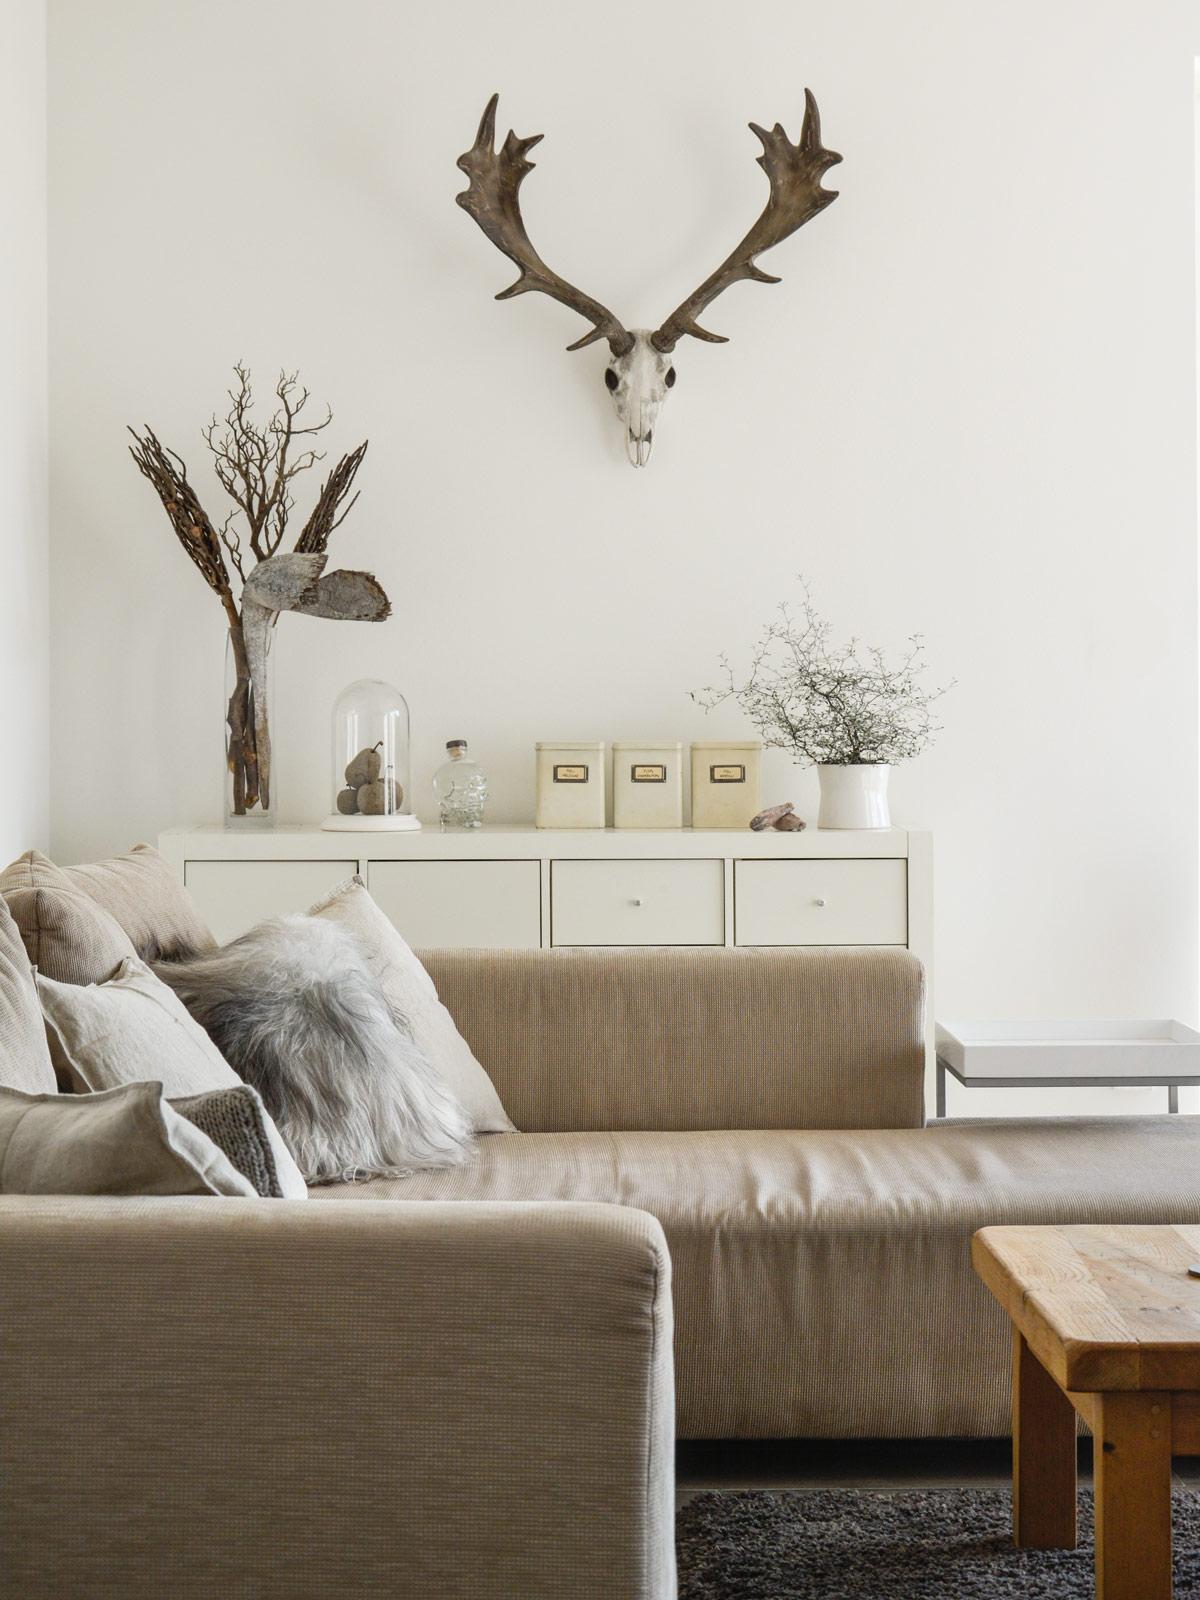 der erste blick durchs schl sselloch mxliving. Black Bedroom Furniture Sets. Home Design Ideas